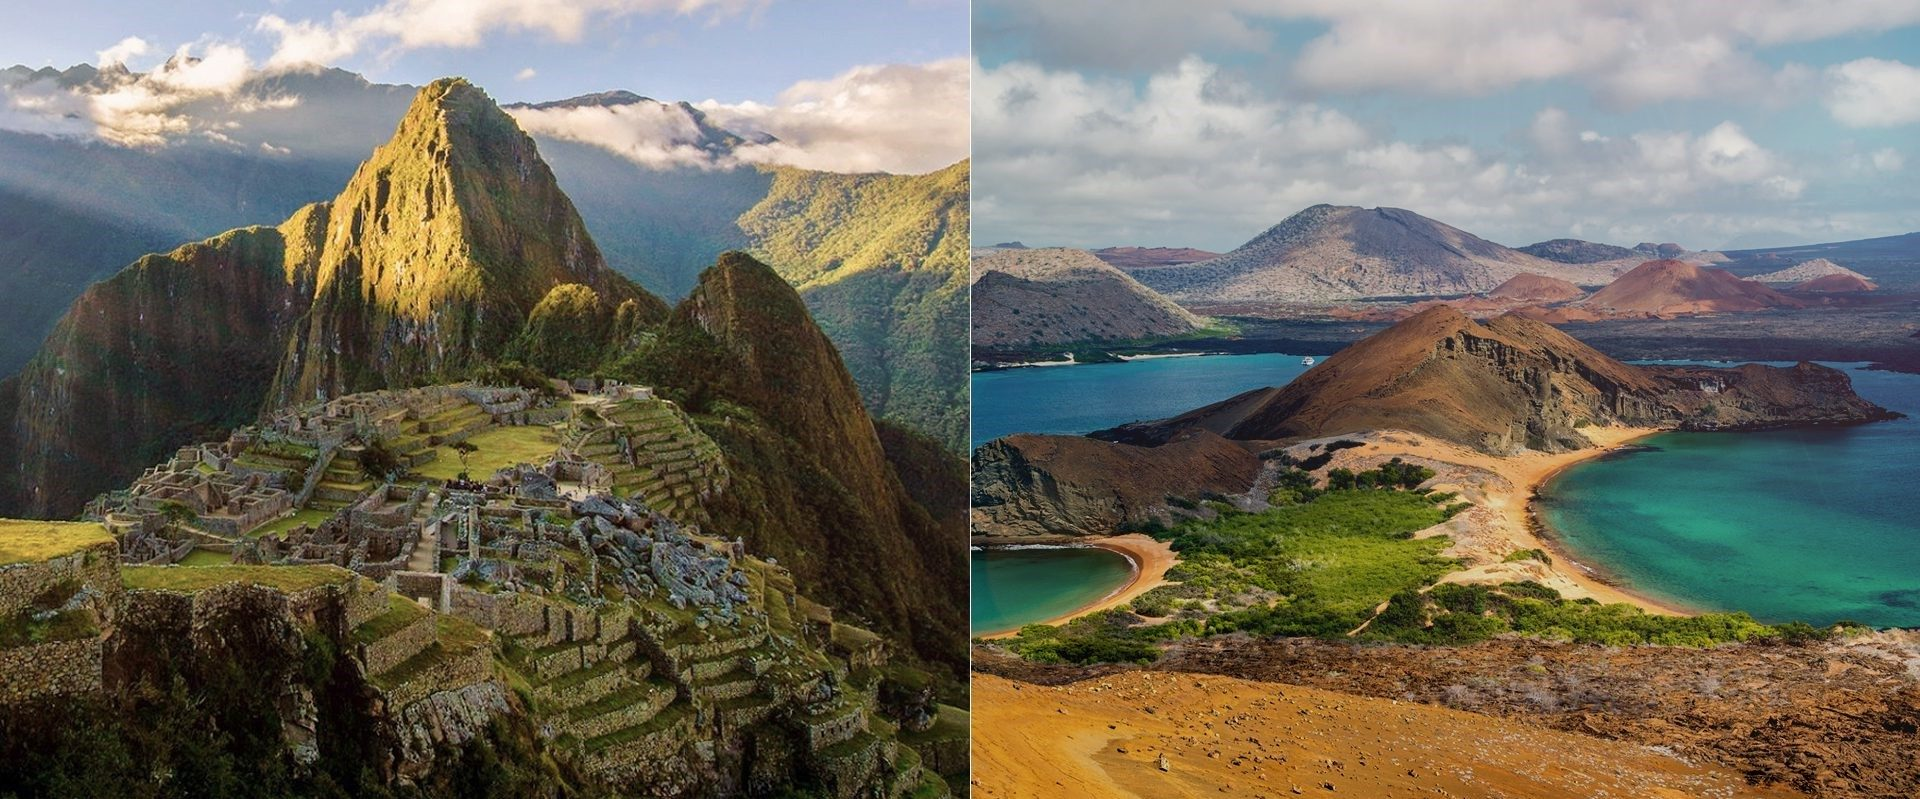 Machu Picchu and Galapagos